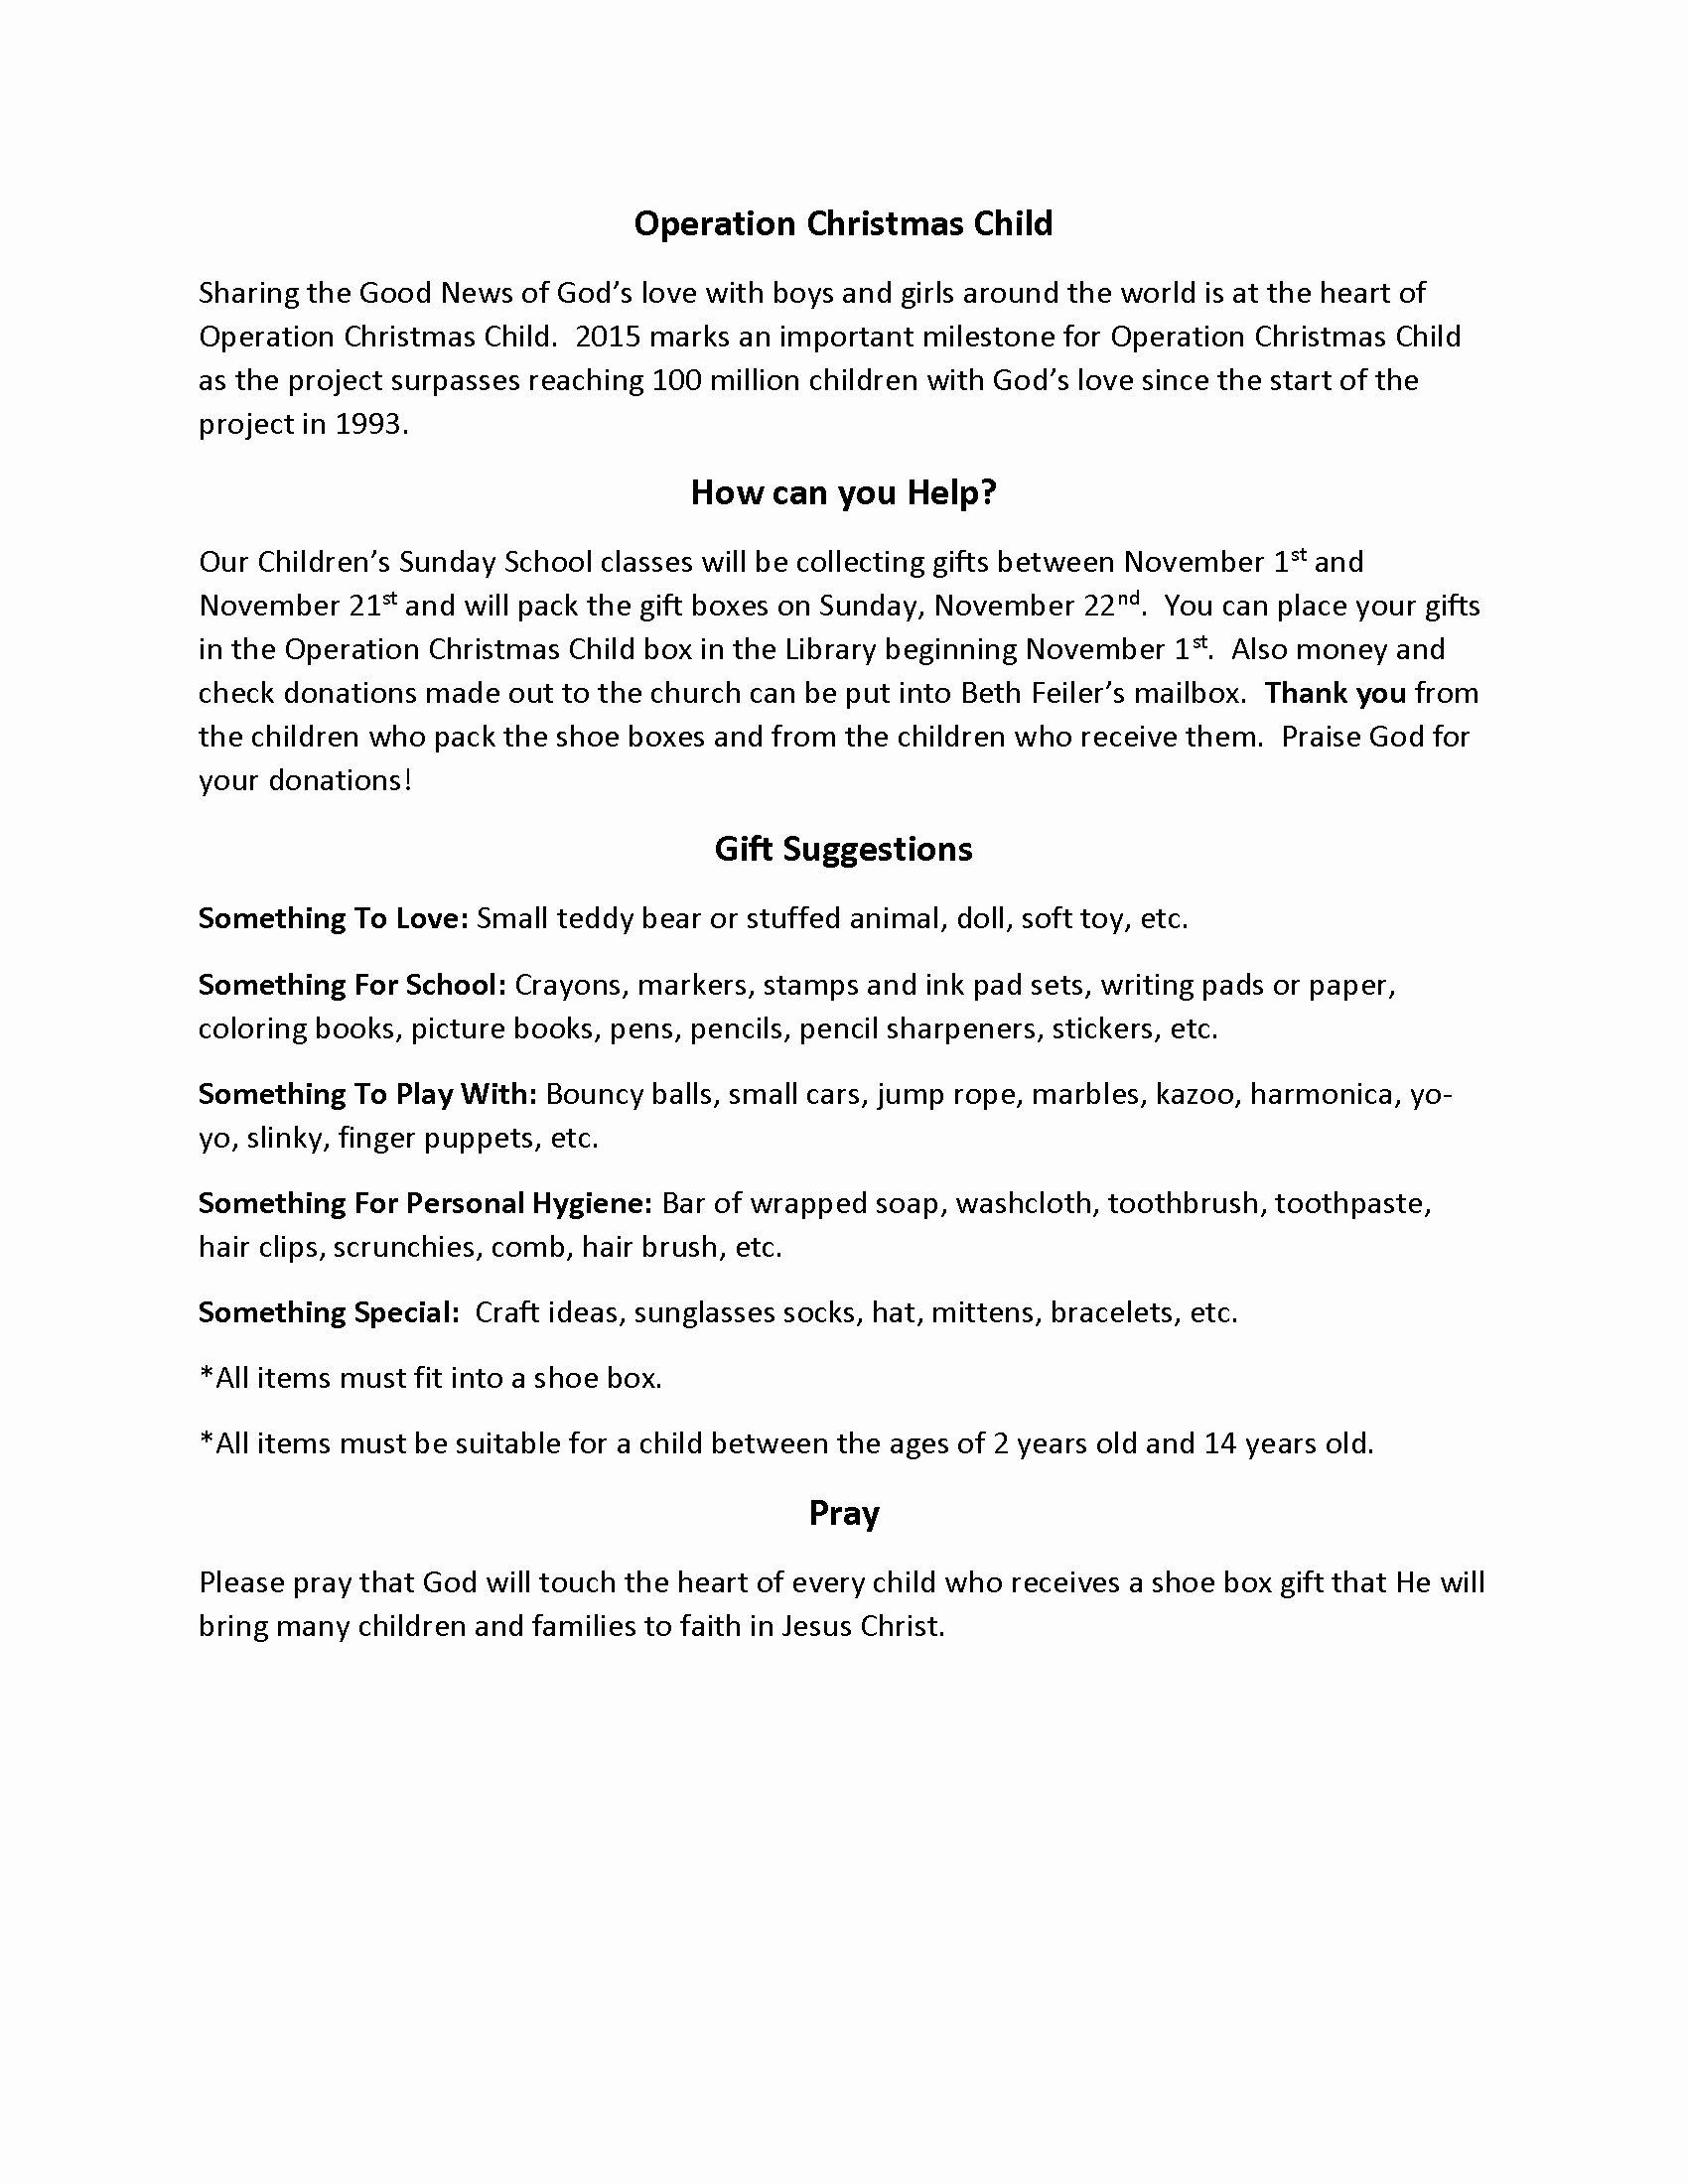 Operation Christmas Child Letter Samples Best Of Operation Christmas Child 2015